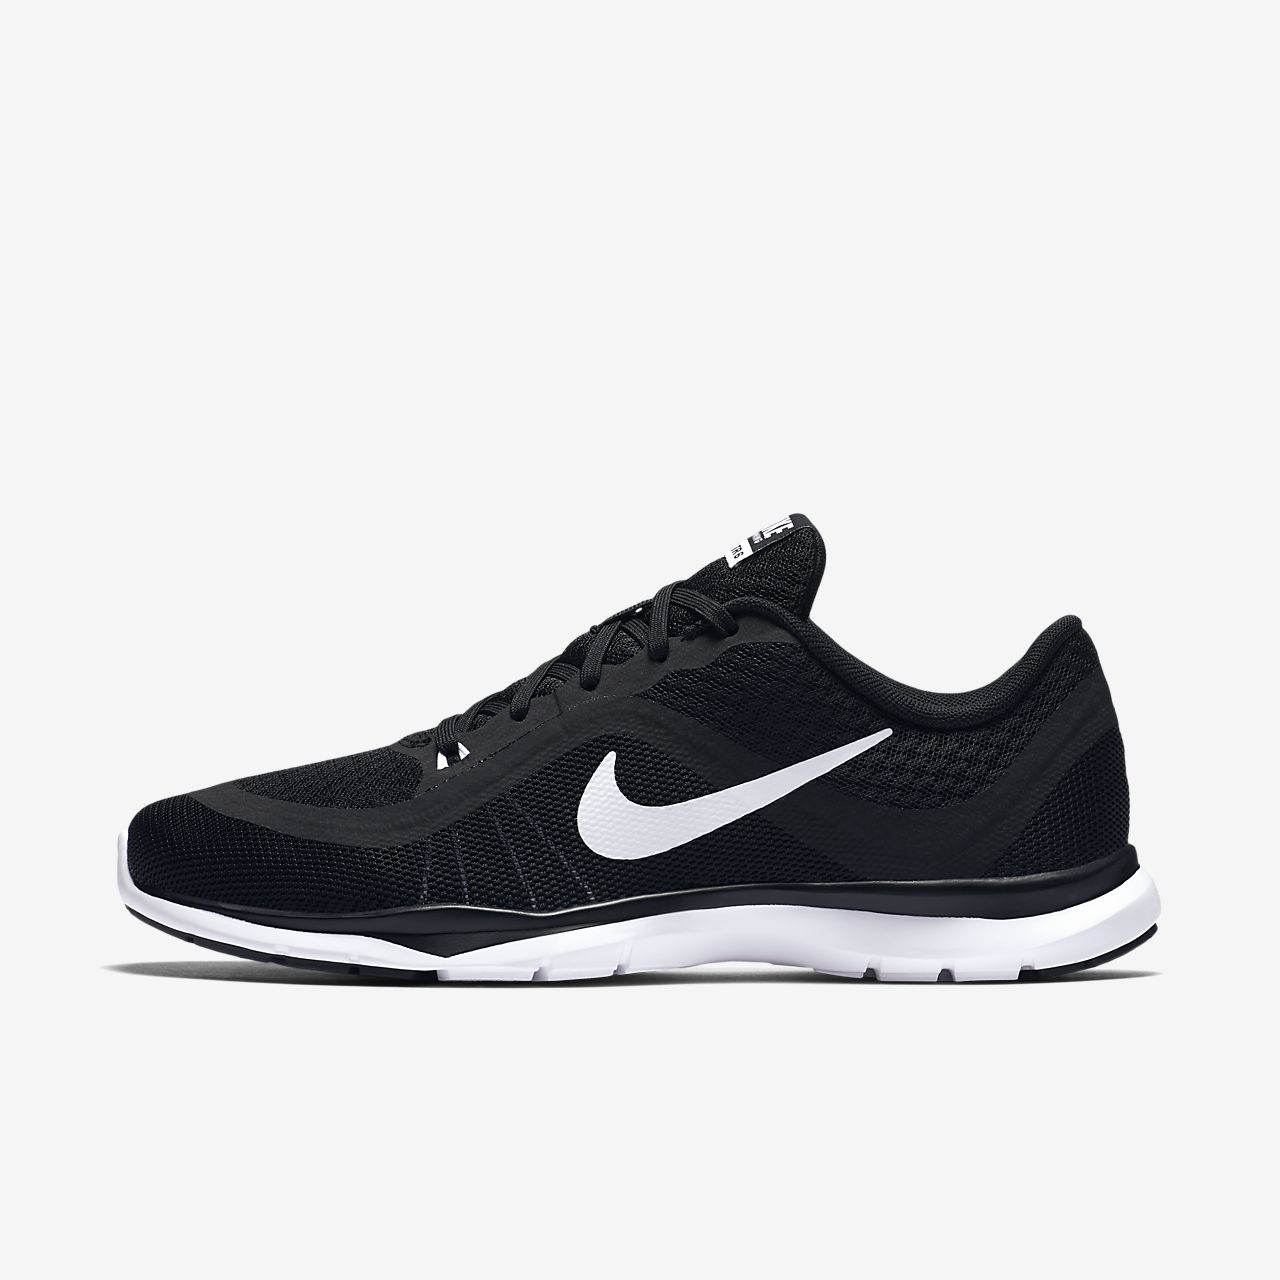 82102e20ca57 ... new style nike flex trainer 6 womens training shoe f0aa3 0071e